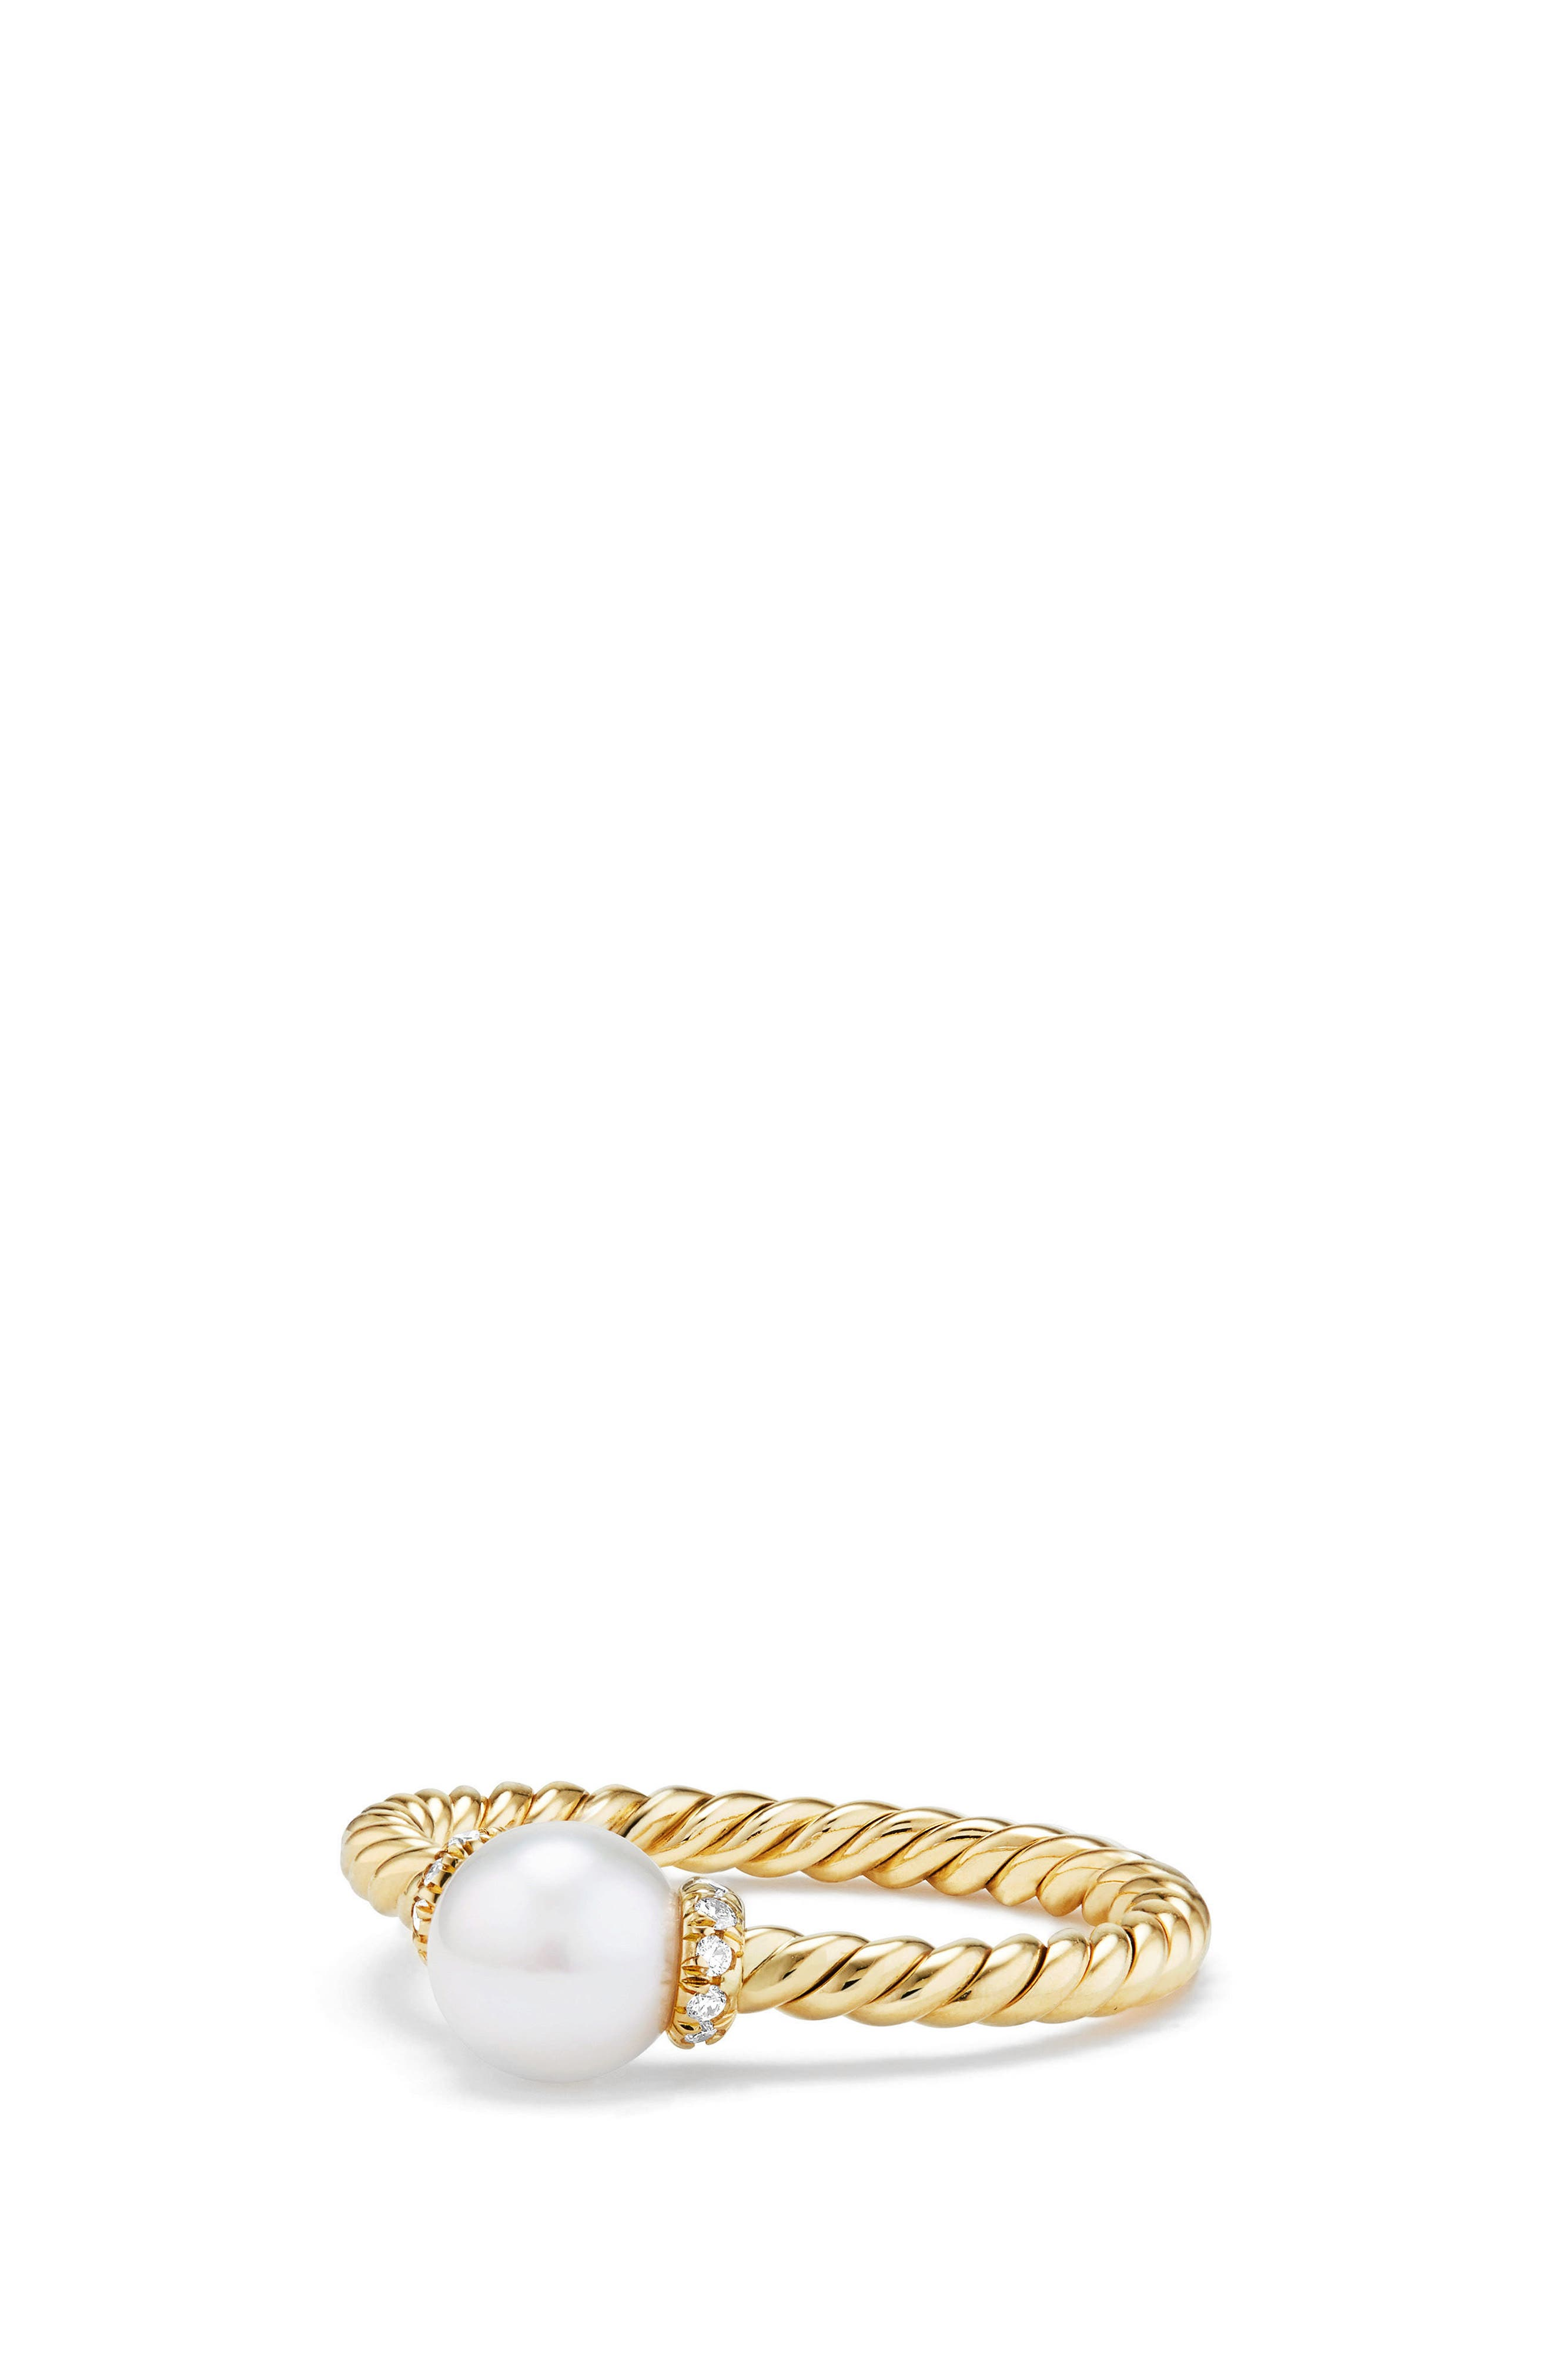 David Yurman Solari Station Ring with Pearl & Diamonds in 18K Gold